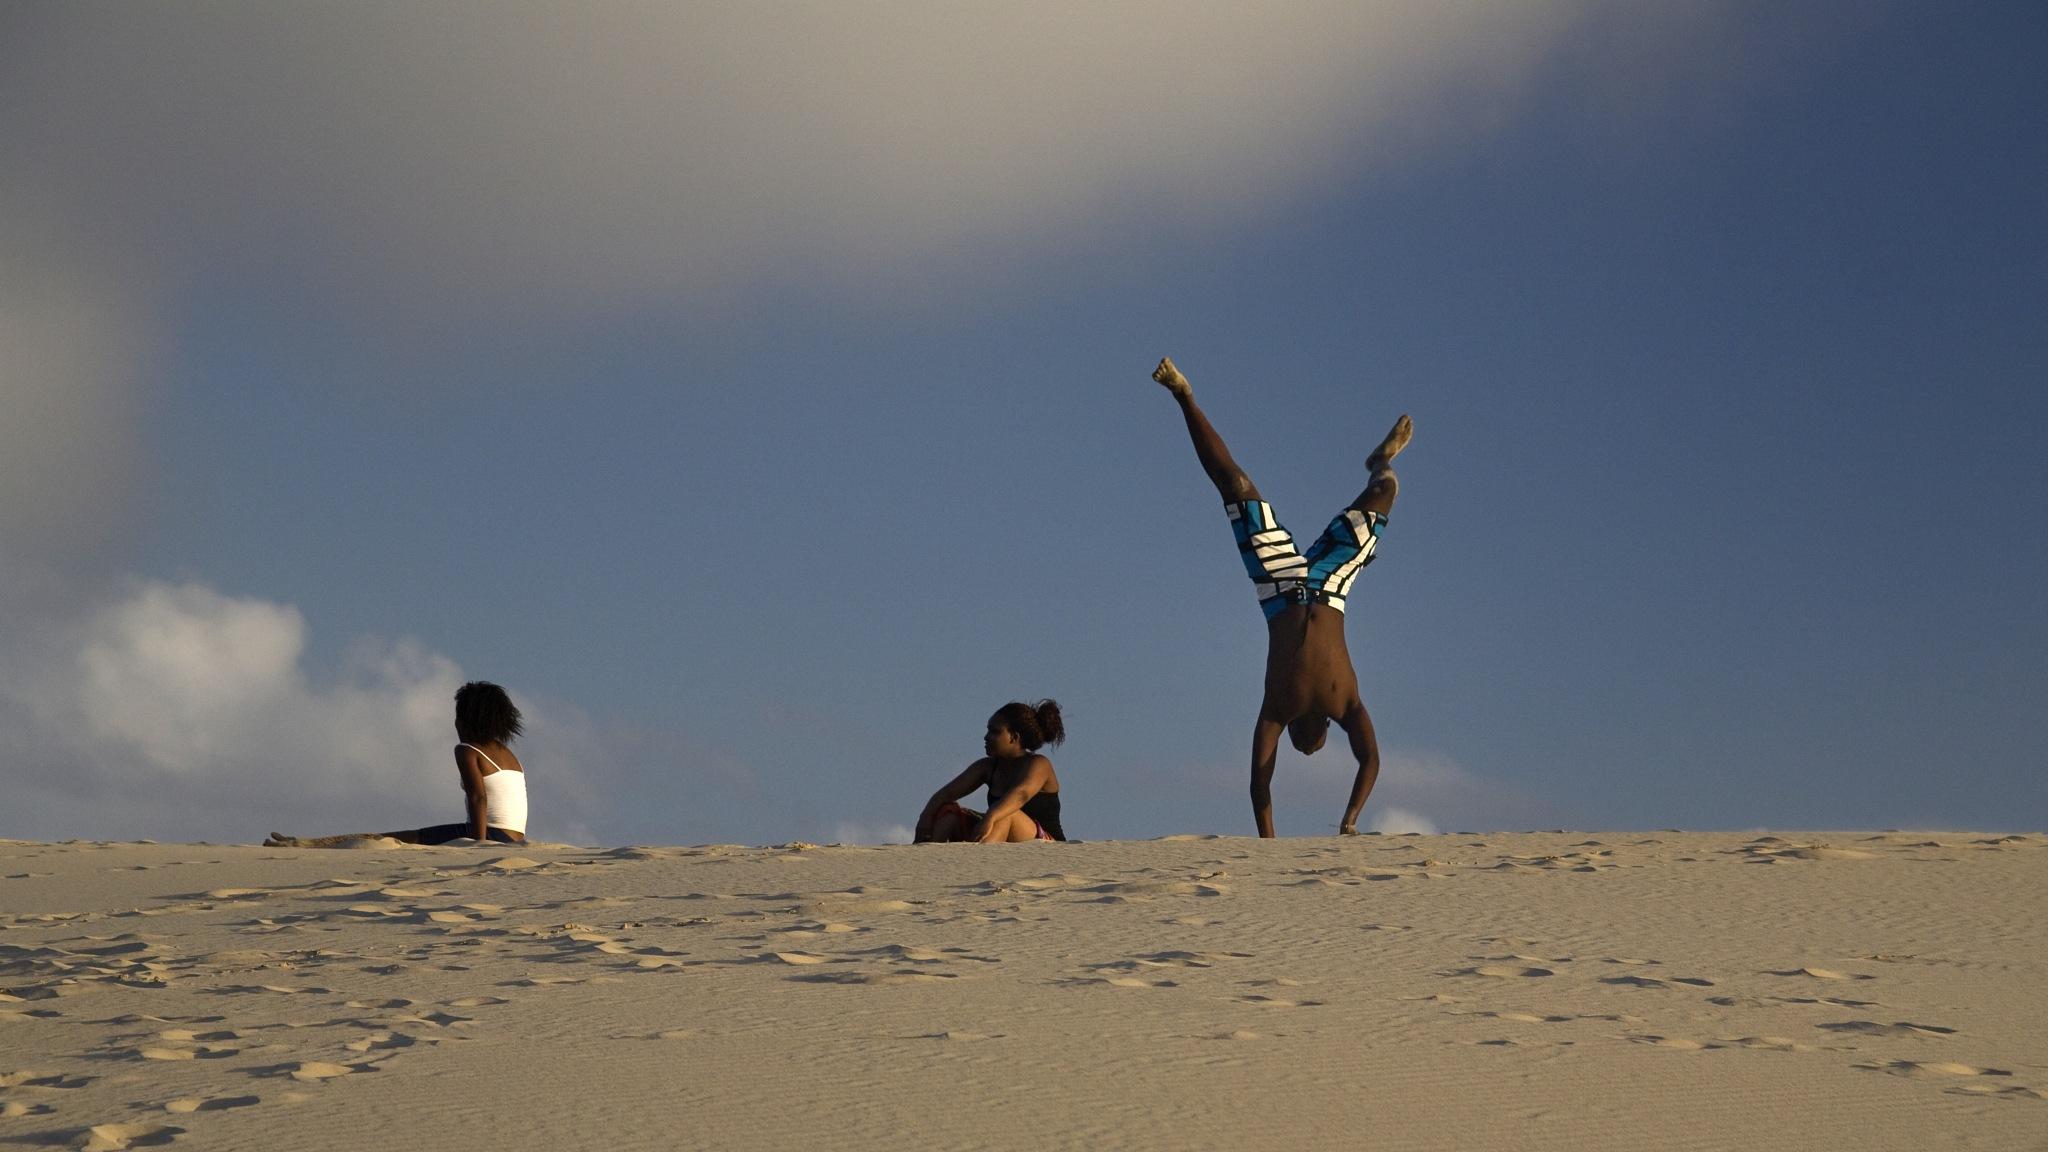 Dune Acrobat by Michael Feistel